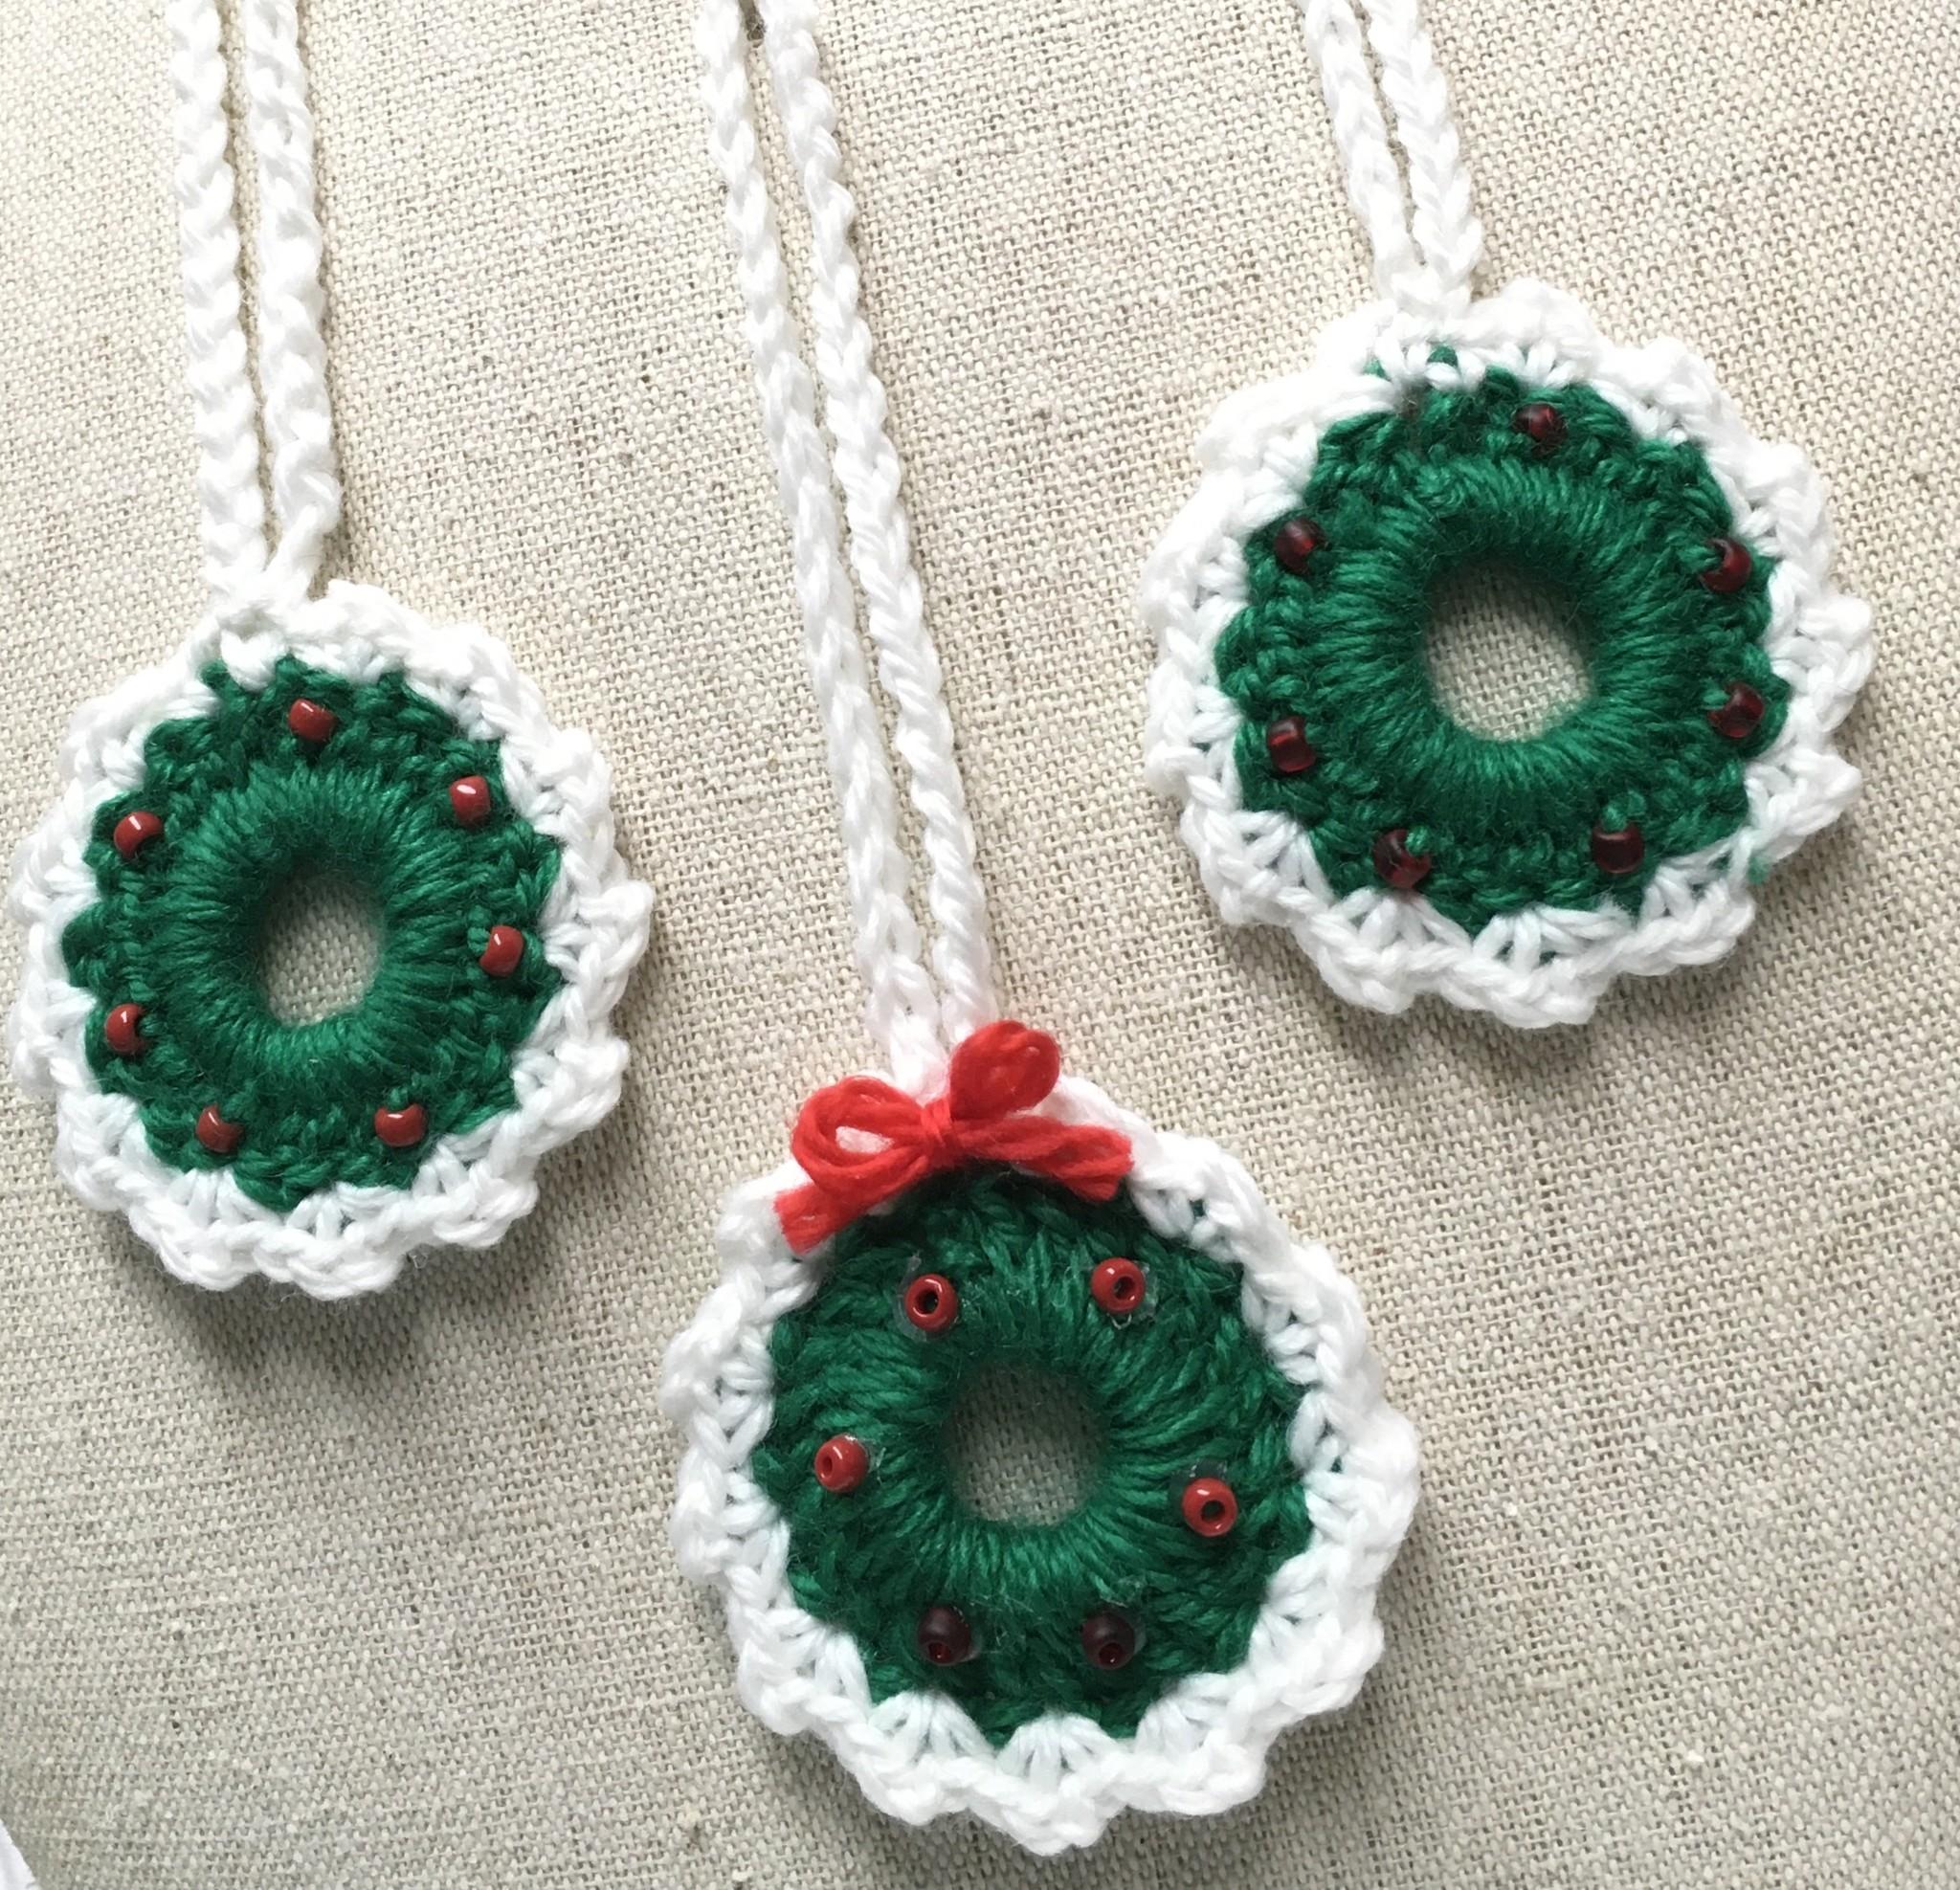 Crochet Wreath Kit 3pcs